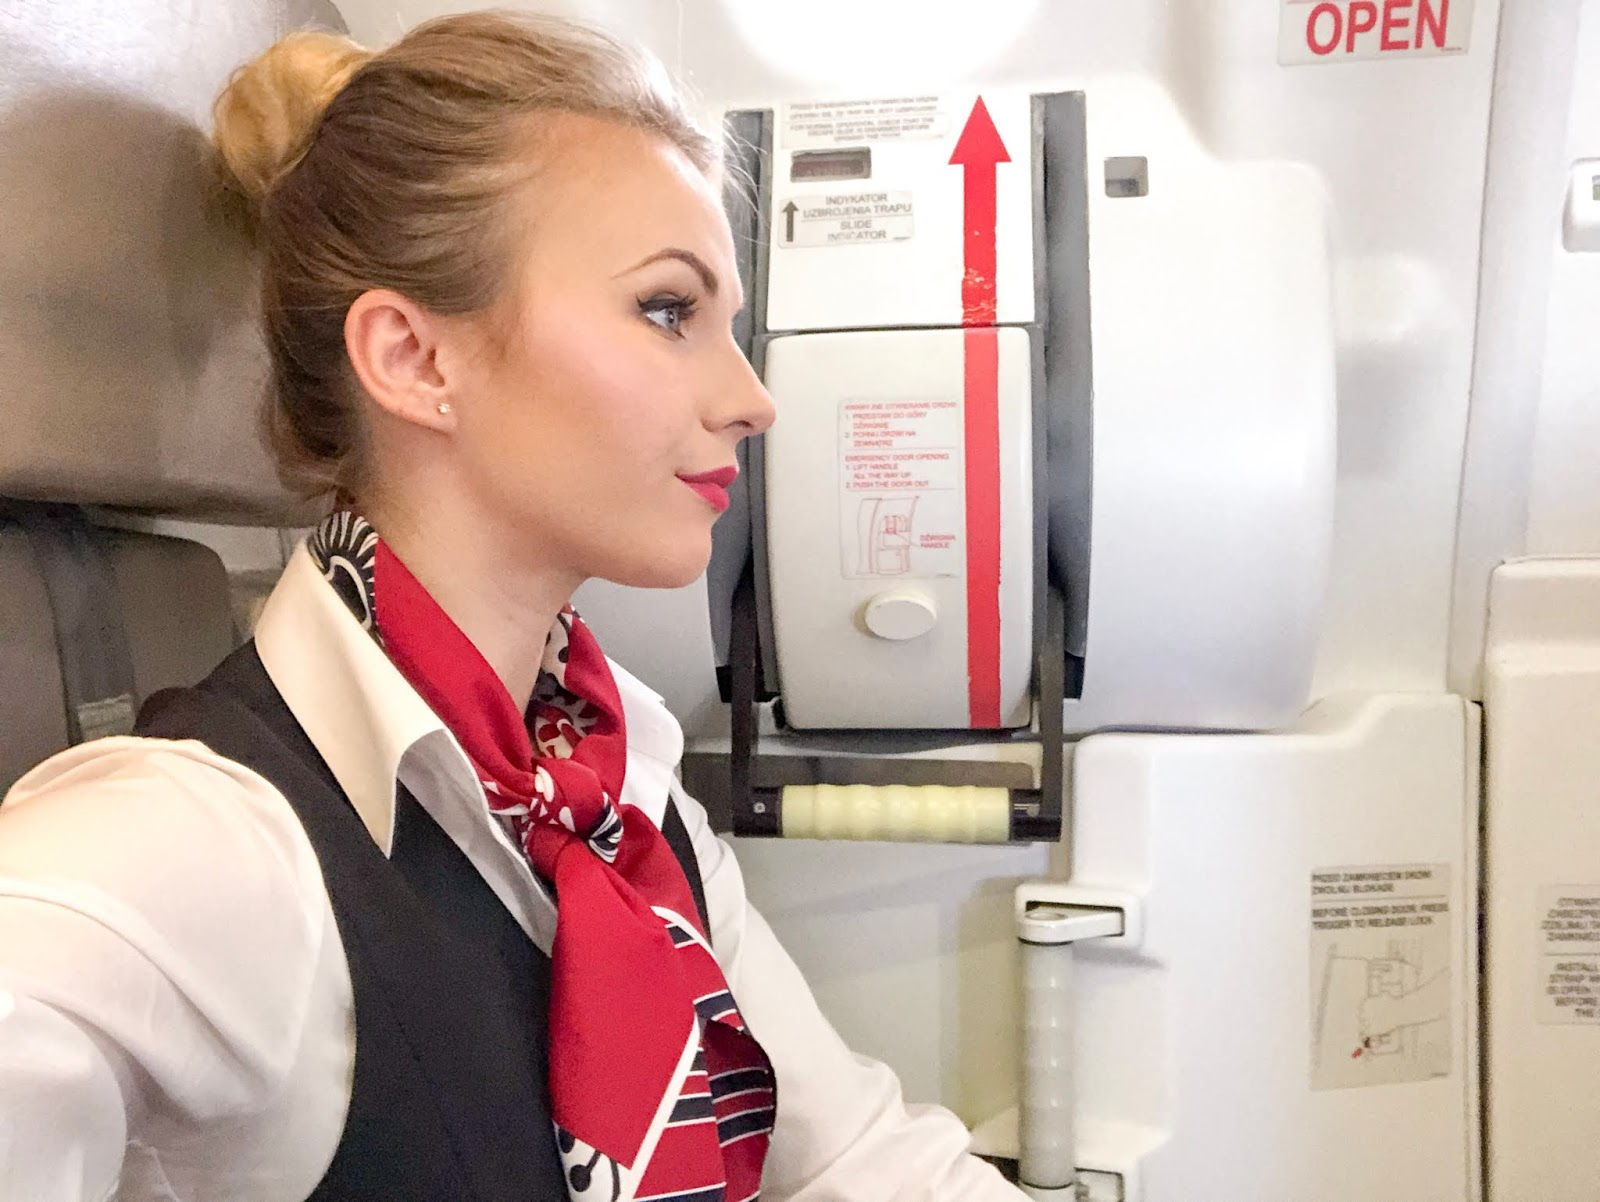 stewardesa.jpg